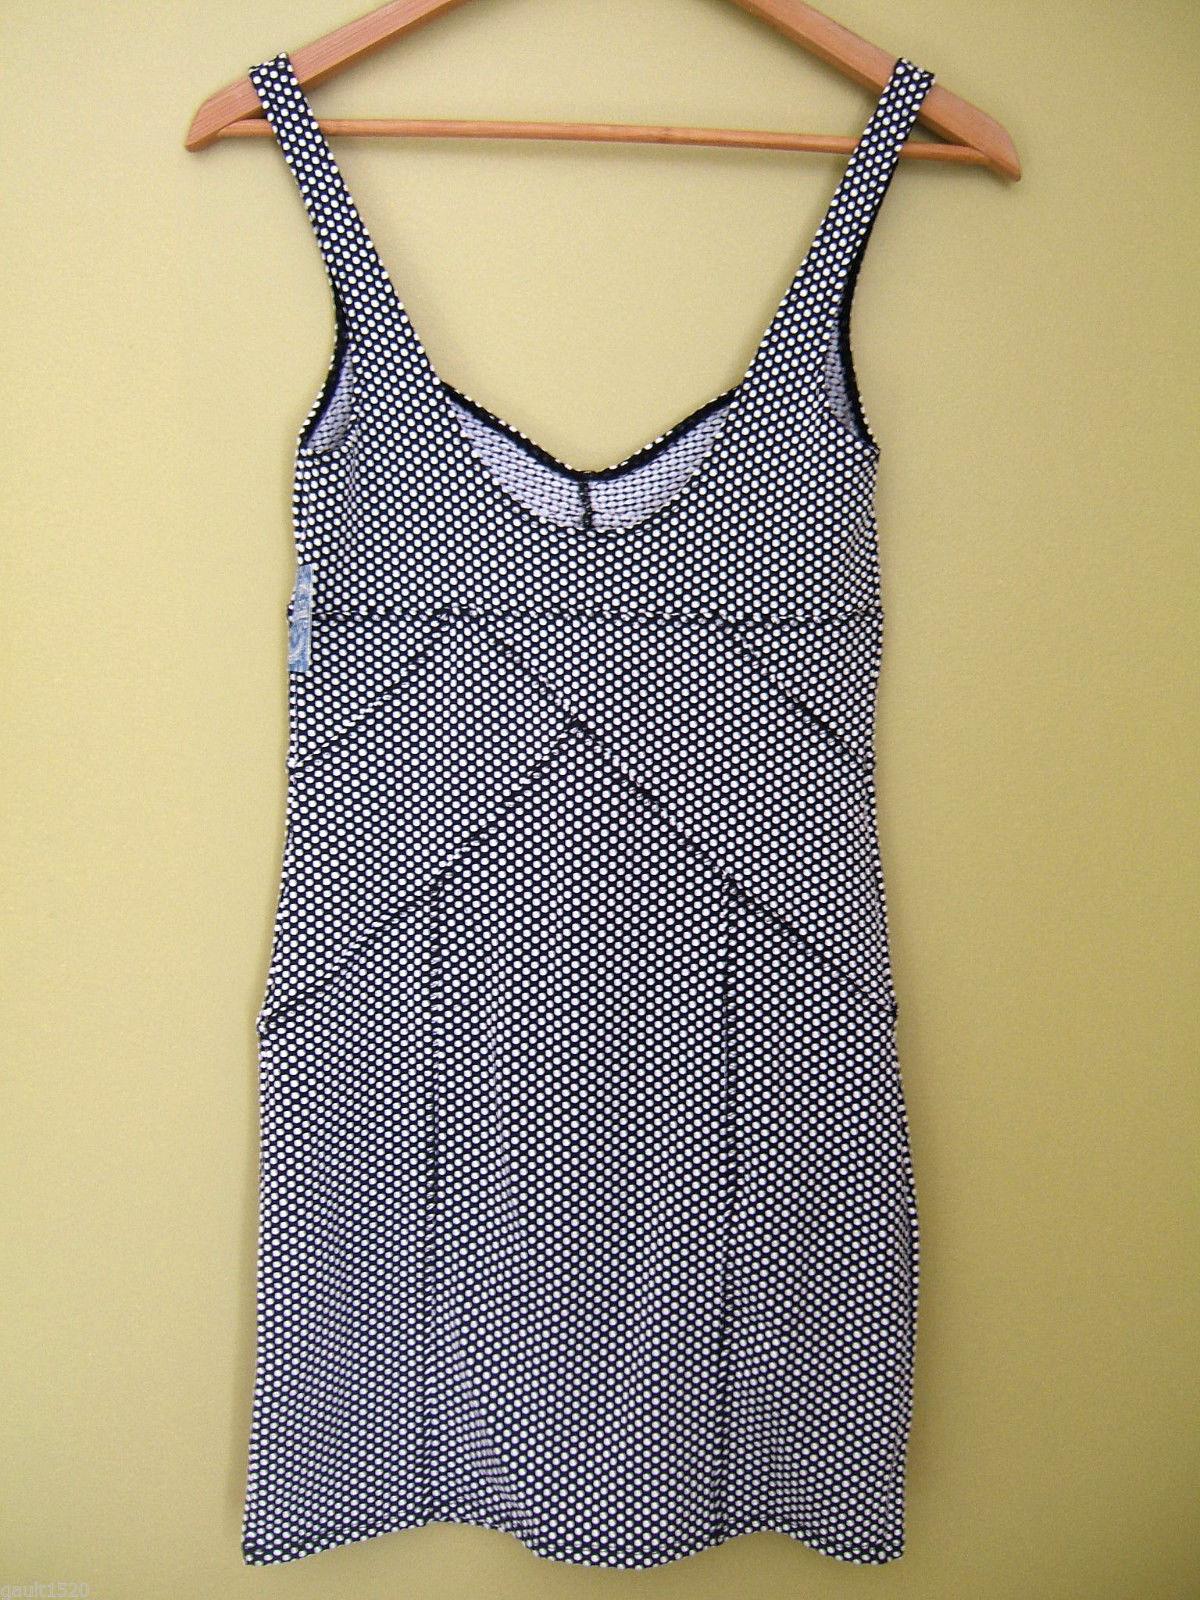 NWT Free People Intimately Sexy Black White Polka Dot BodyCon Sheath Dress S $98